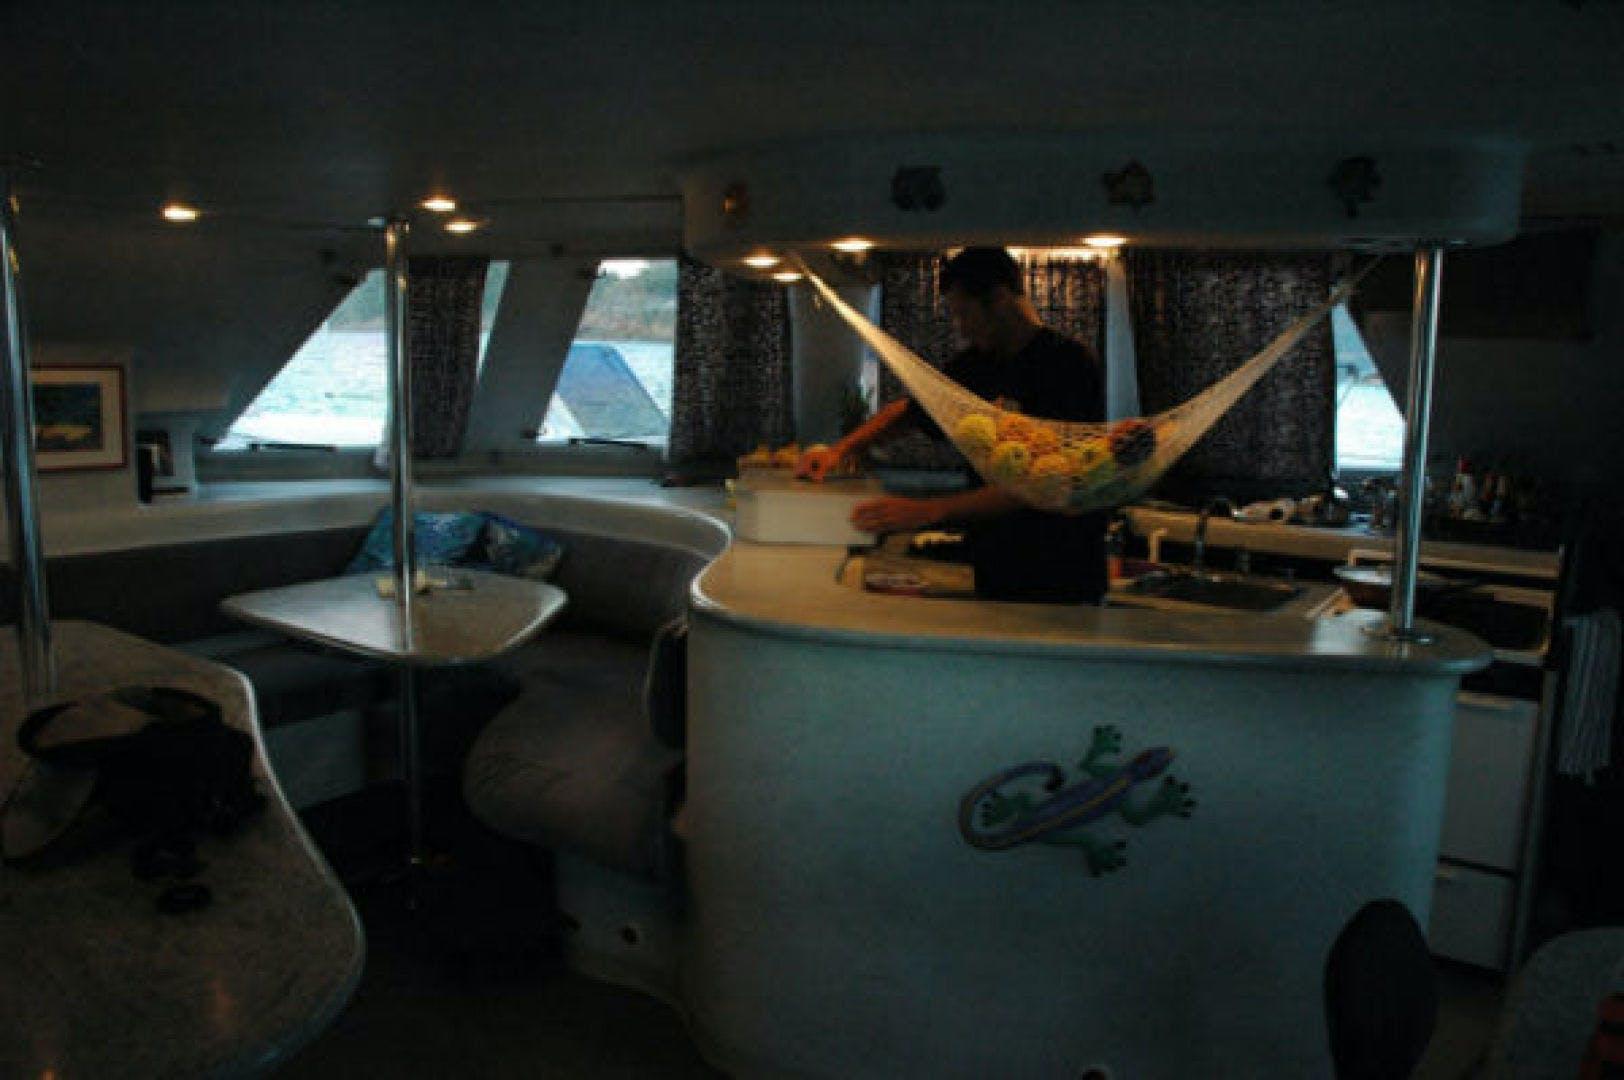 1999 Catamaran Custom Commercial Term Charter 60' Catamaran 60 No Name | Picture 7 of 16